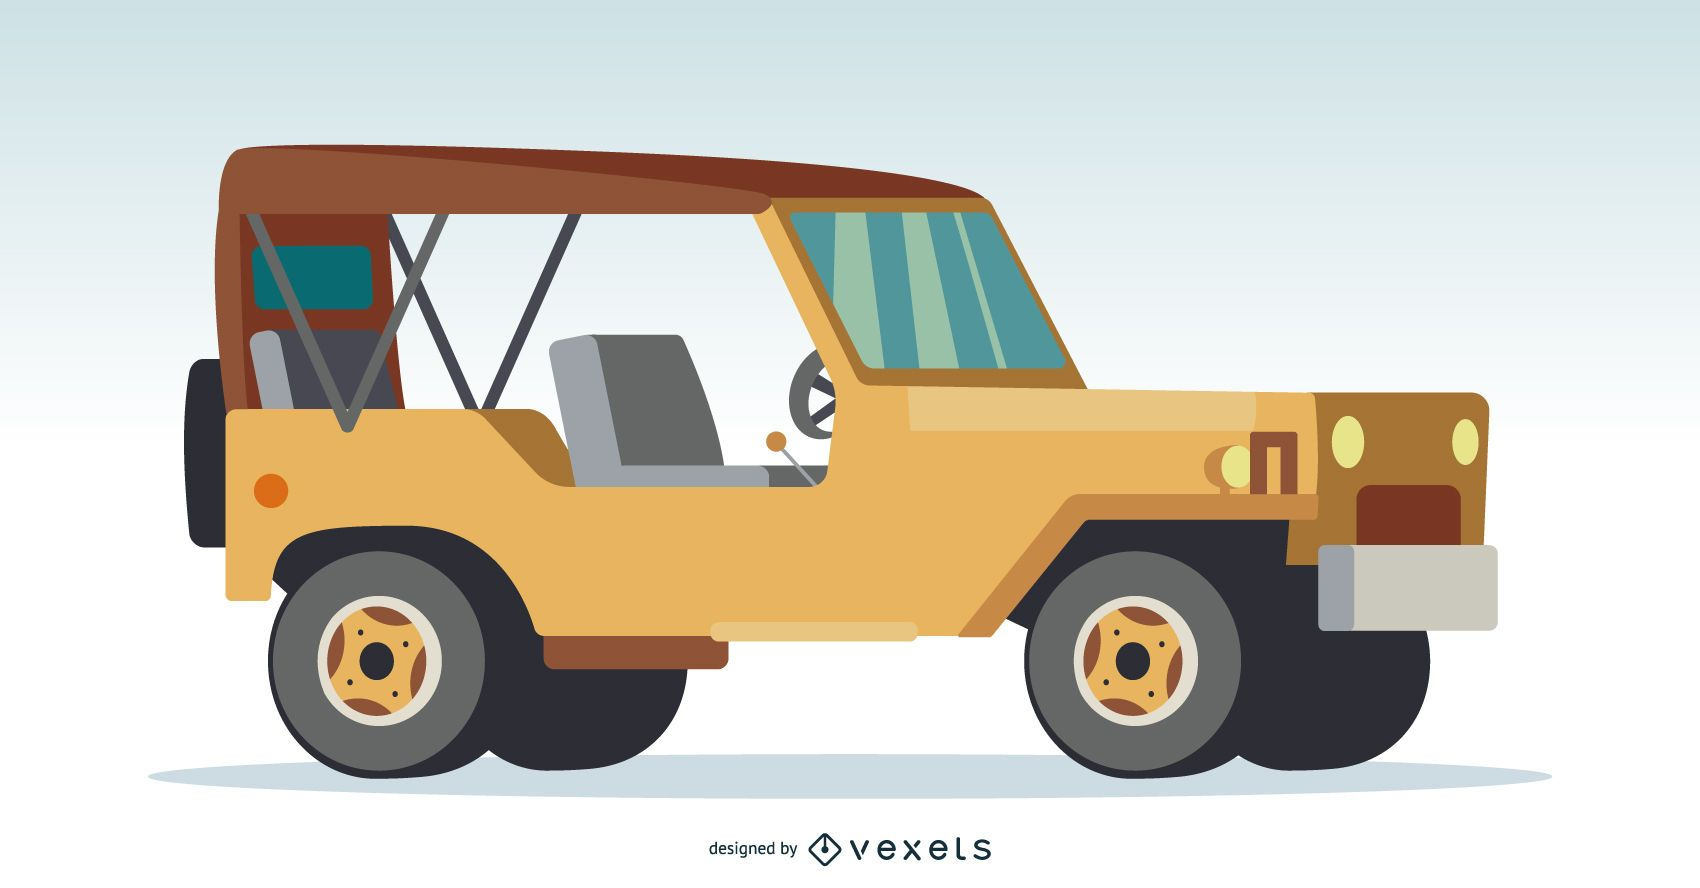 Brown 4x4 off-road car illustration